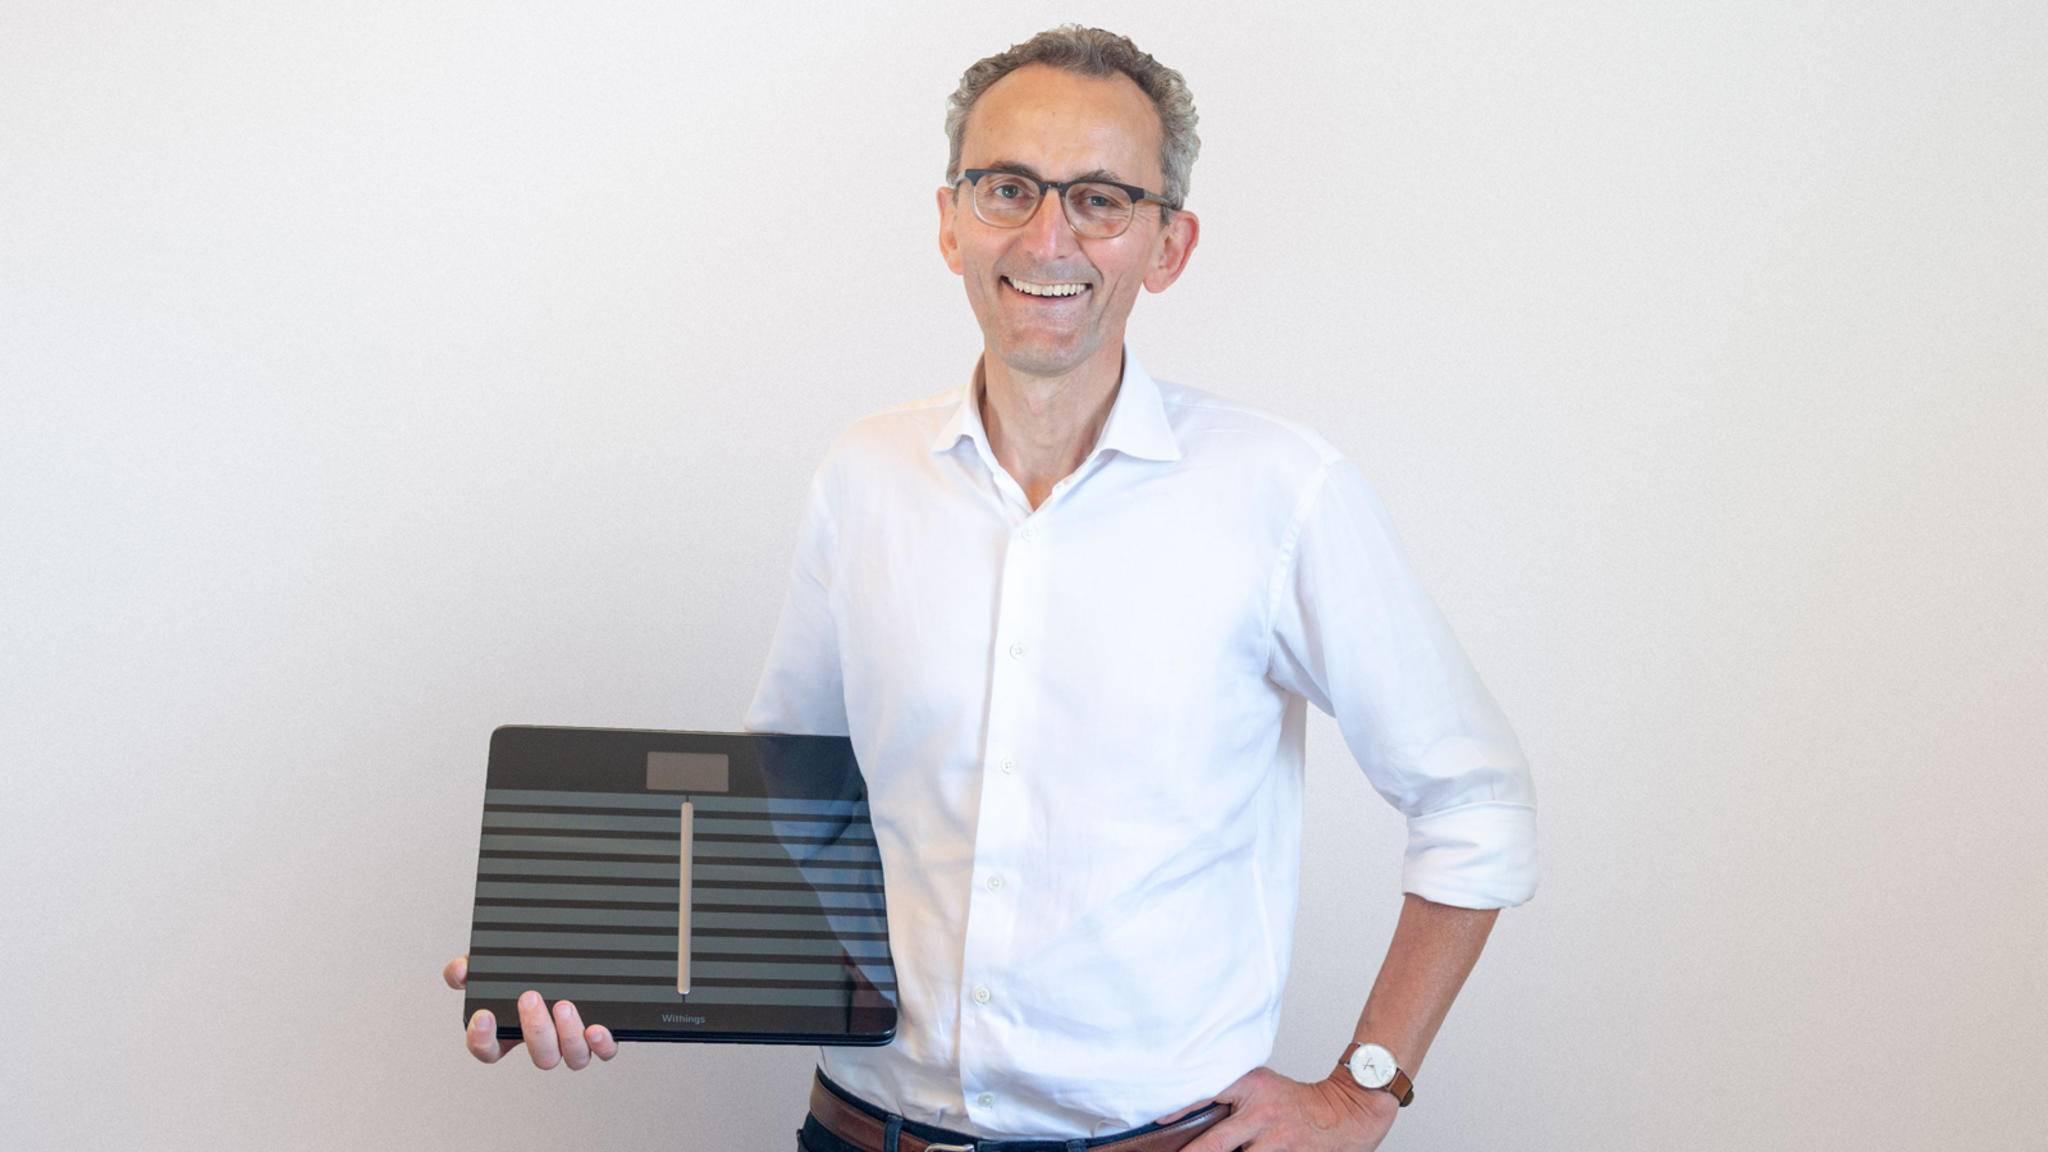 Eric Carreel plant in großem Stil: Ende 2018 will er neue Produkte auf den Markt bringen.